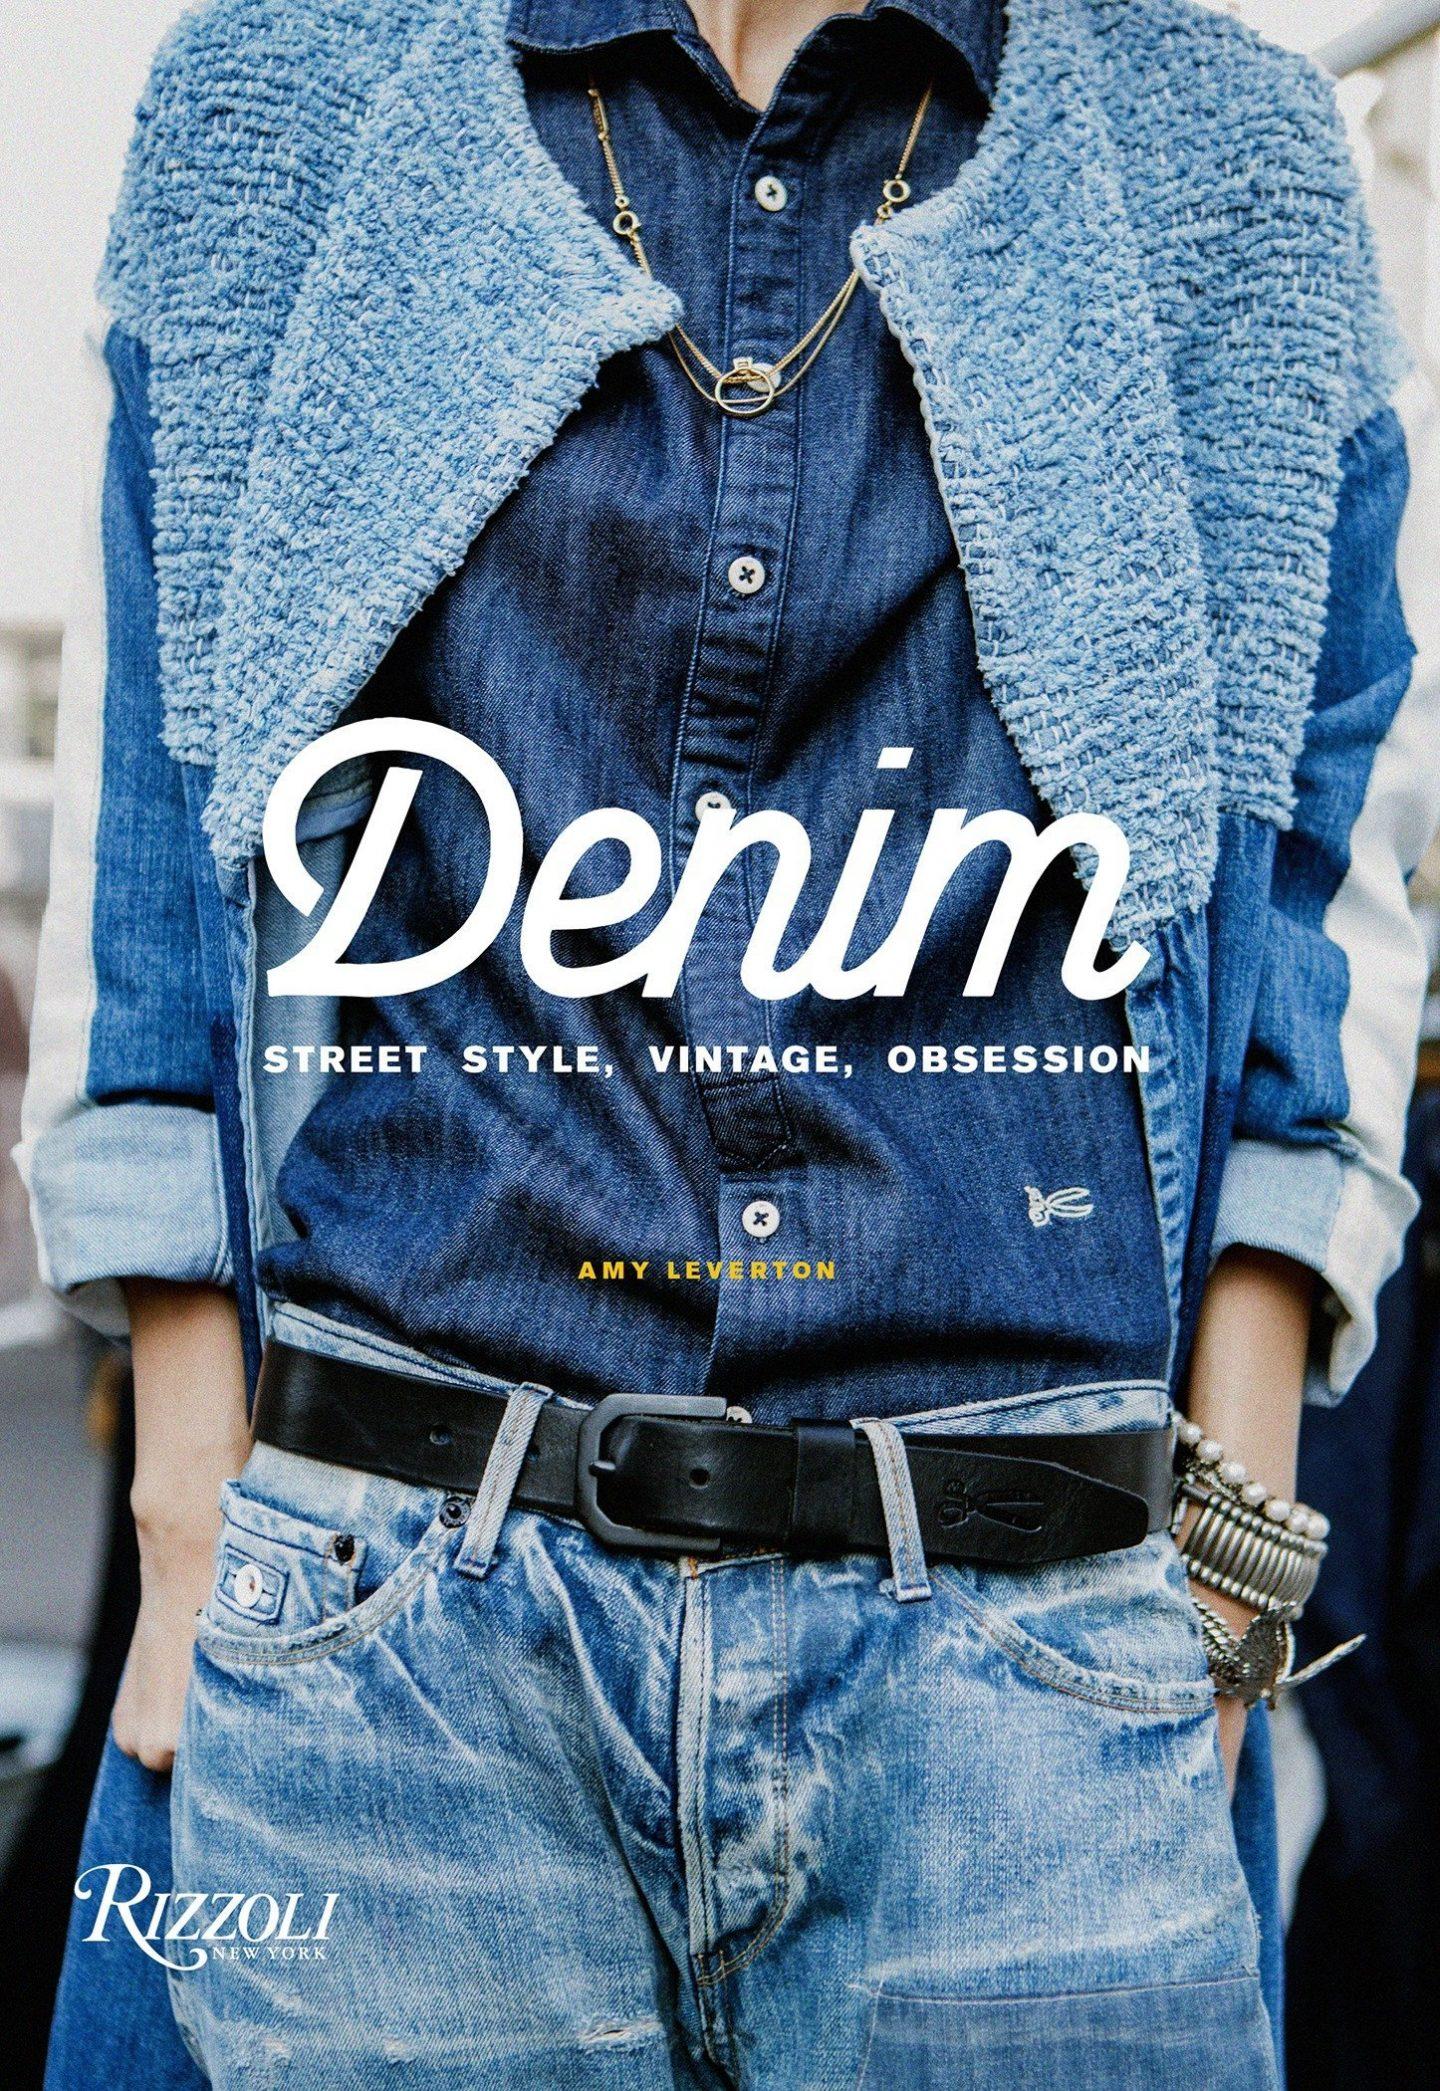 Denim – Street Style, Vintage, Obsession